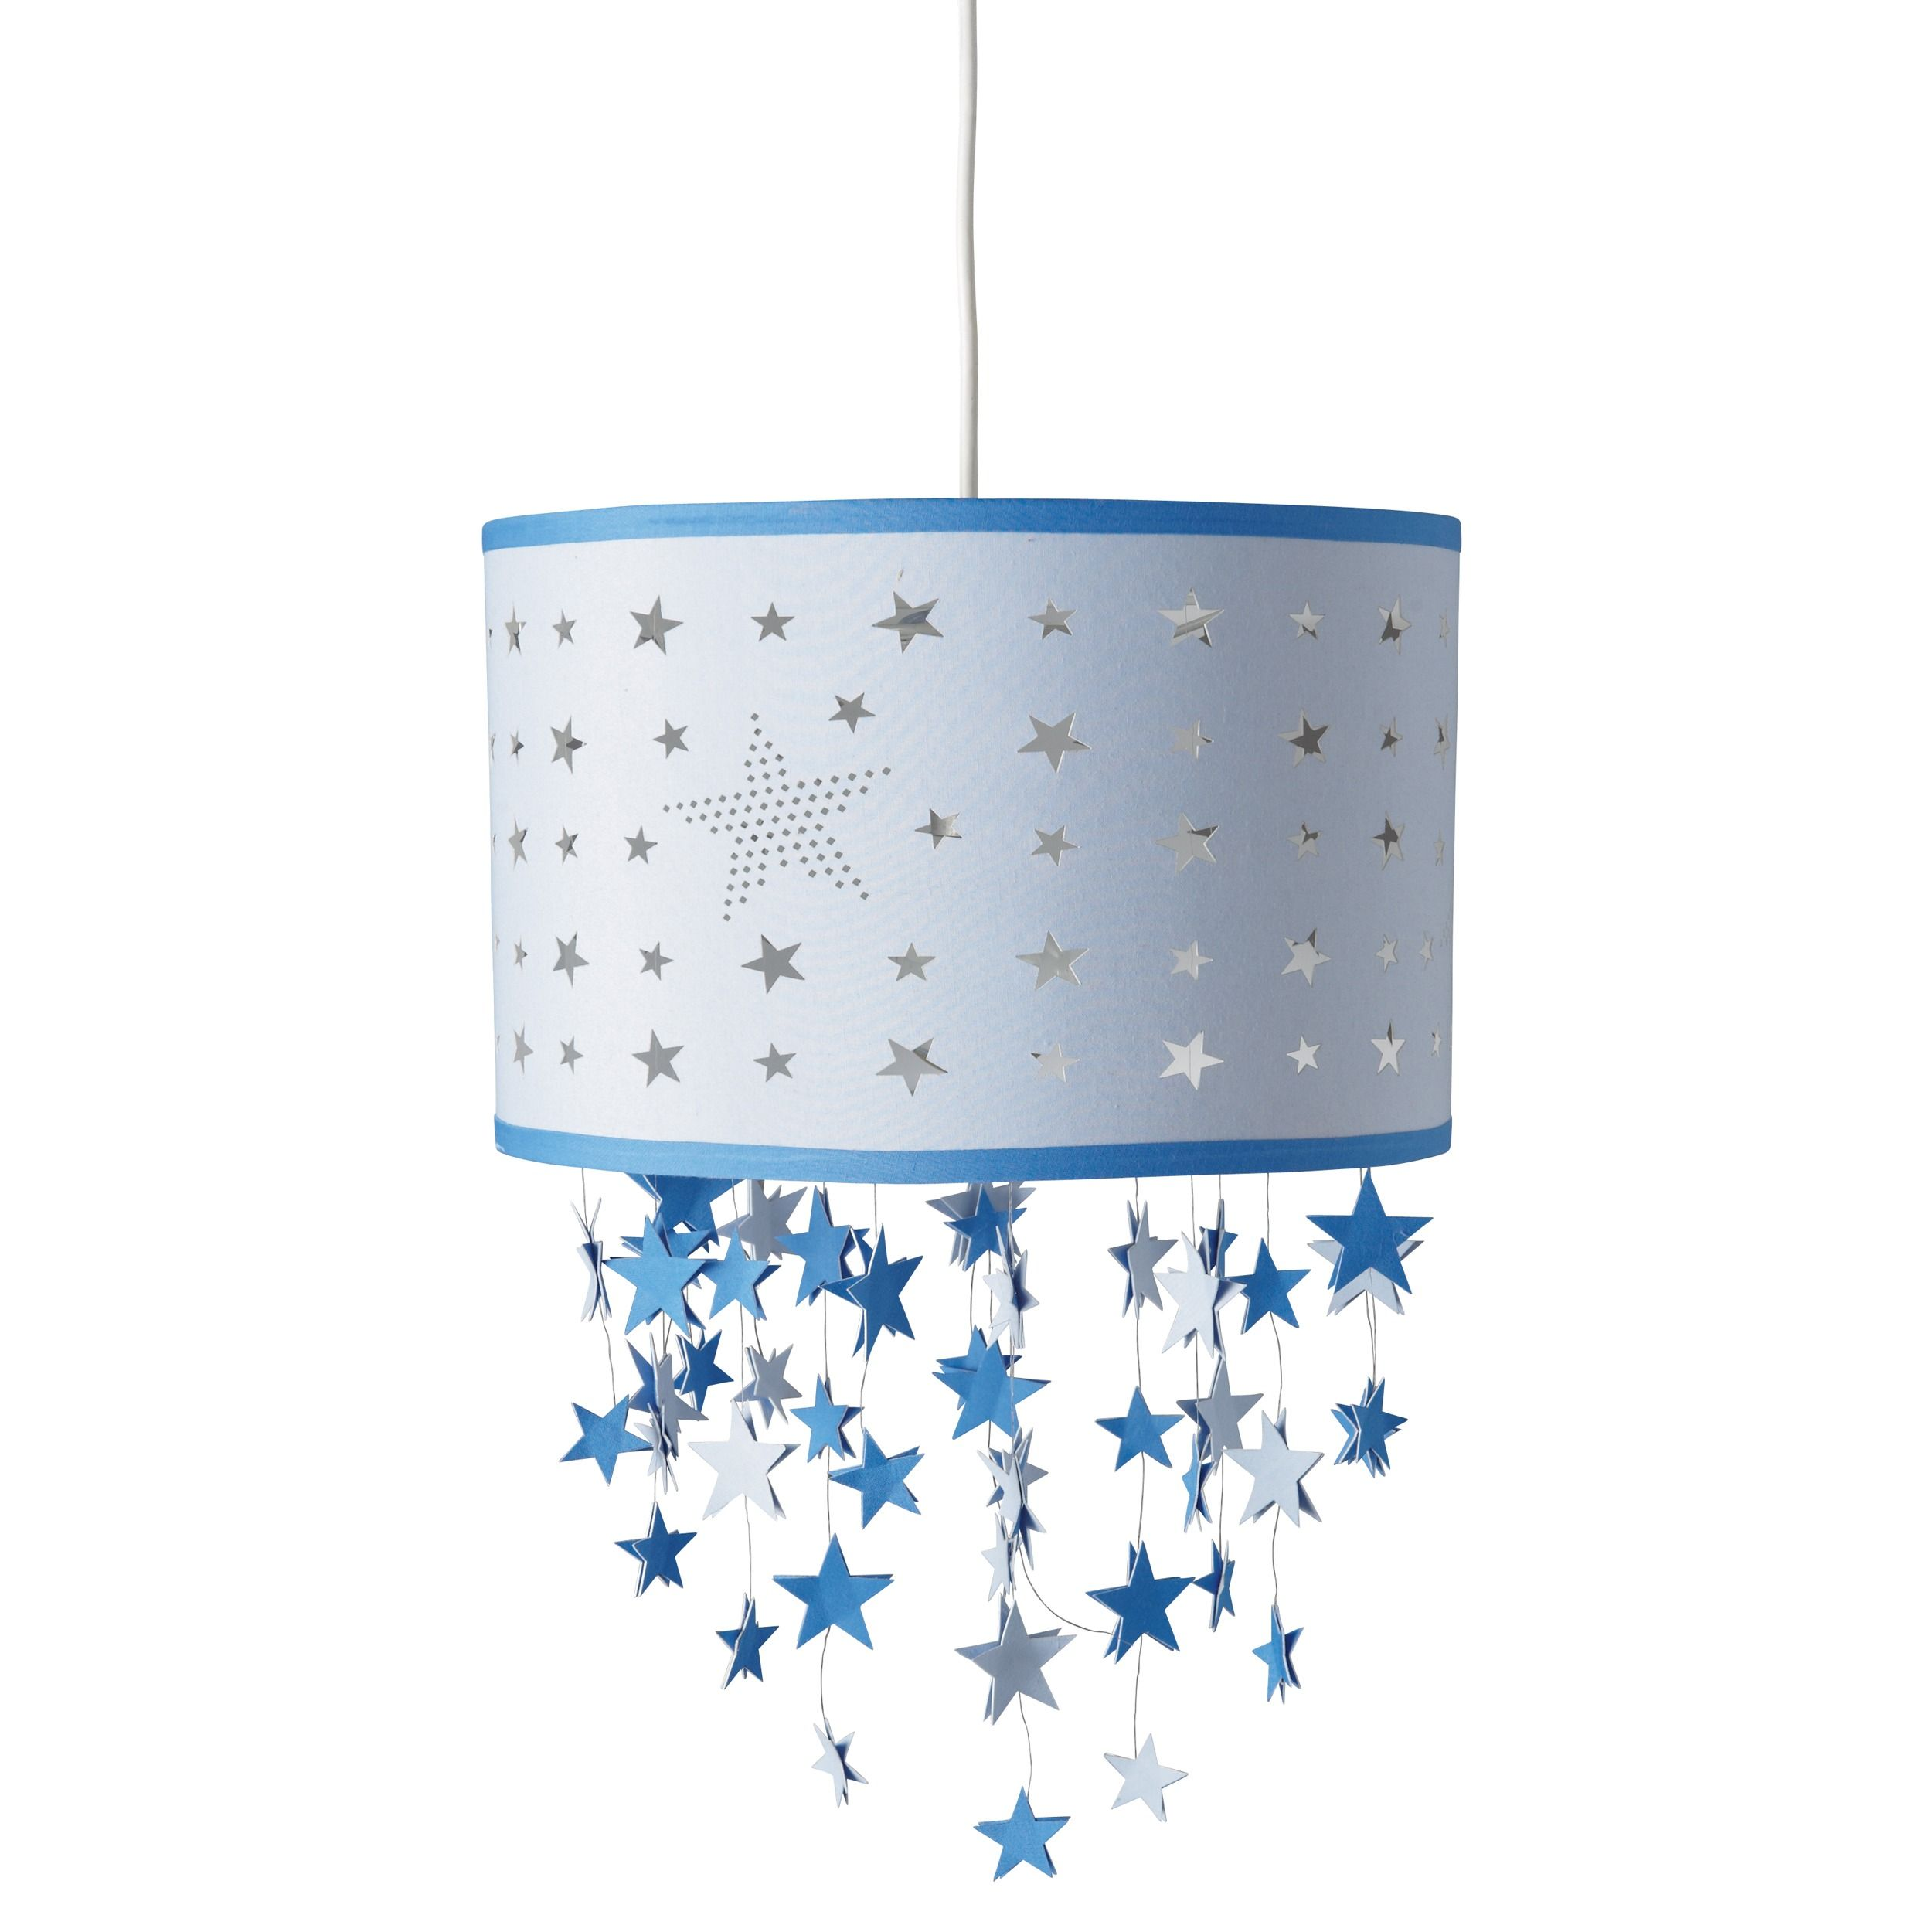 laura ashley blue stars mobile ceiling shade a fun ceiling